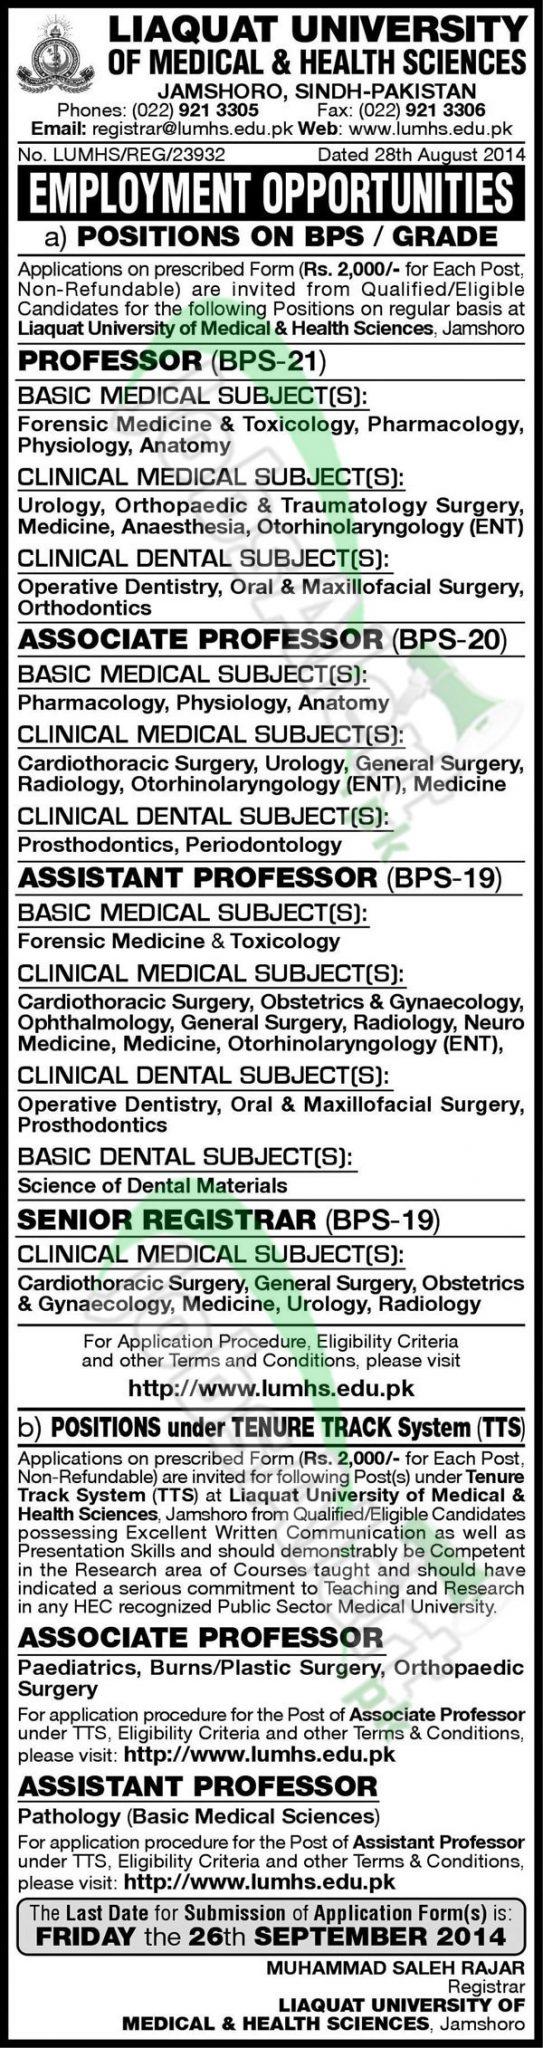 Liaquat University of Medical & Health Sciences (LUMHS) Jamshoro